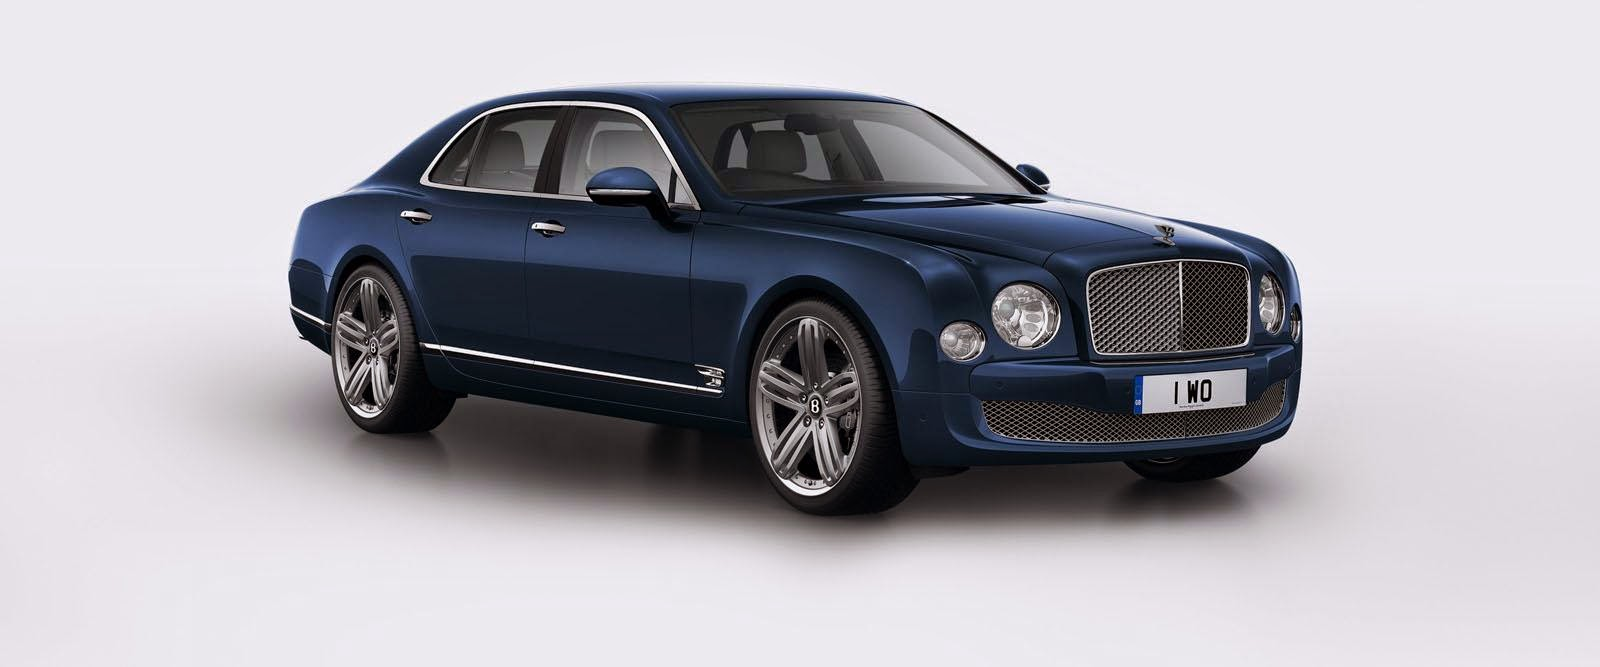 [Resim: Bentley+Mulsanne+95+Edition+1.jpg]